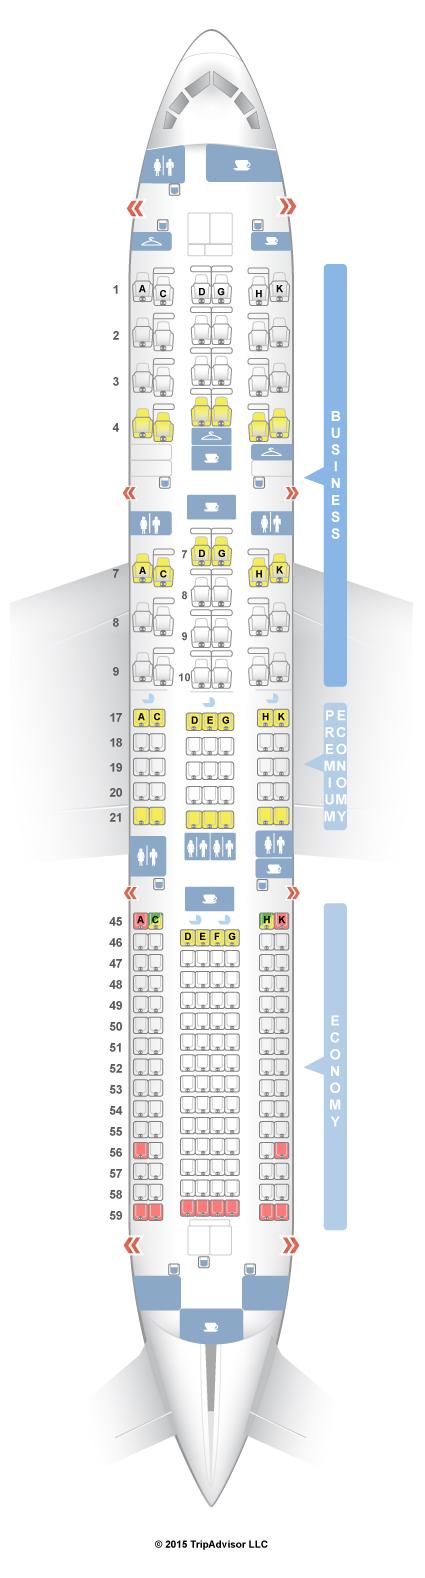 SeatGuru Seat Map Japan Airlines - SeatGuru